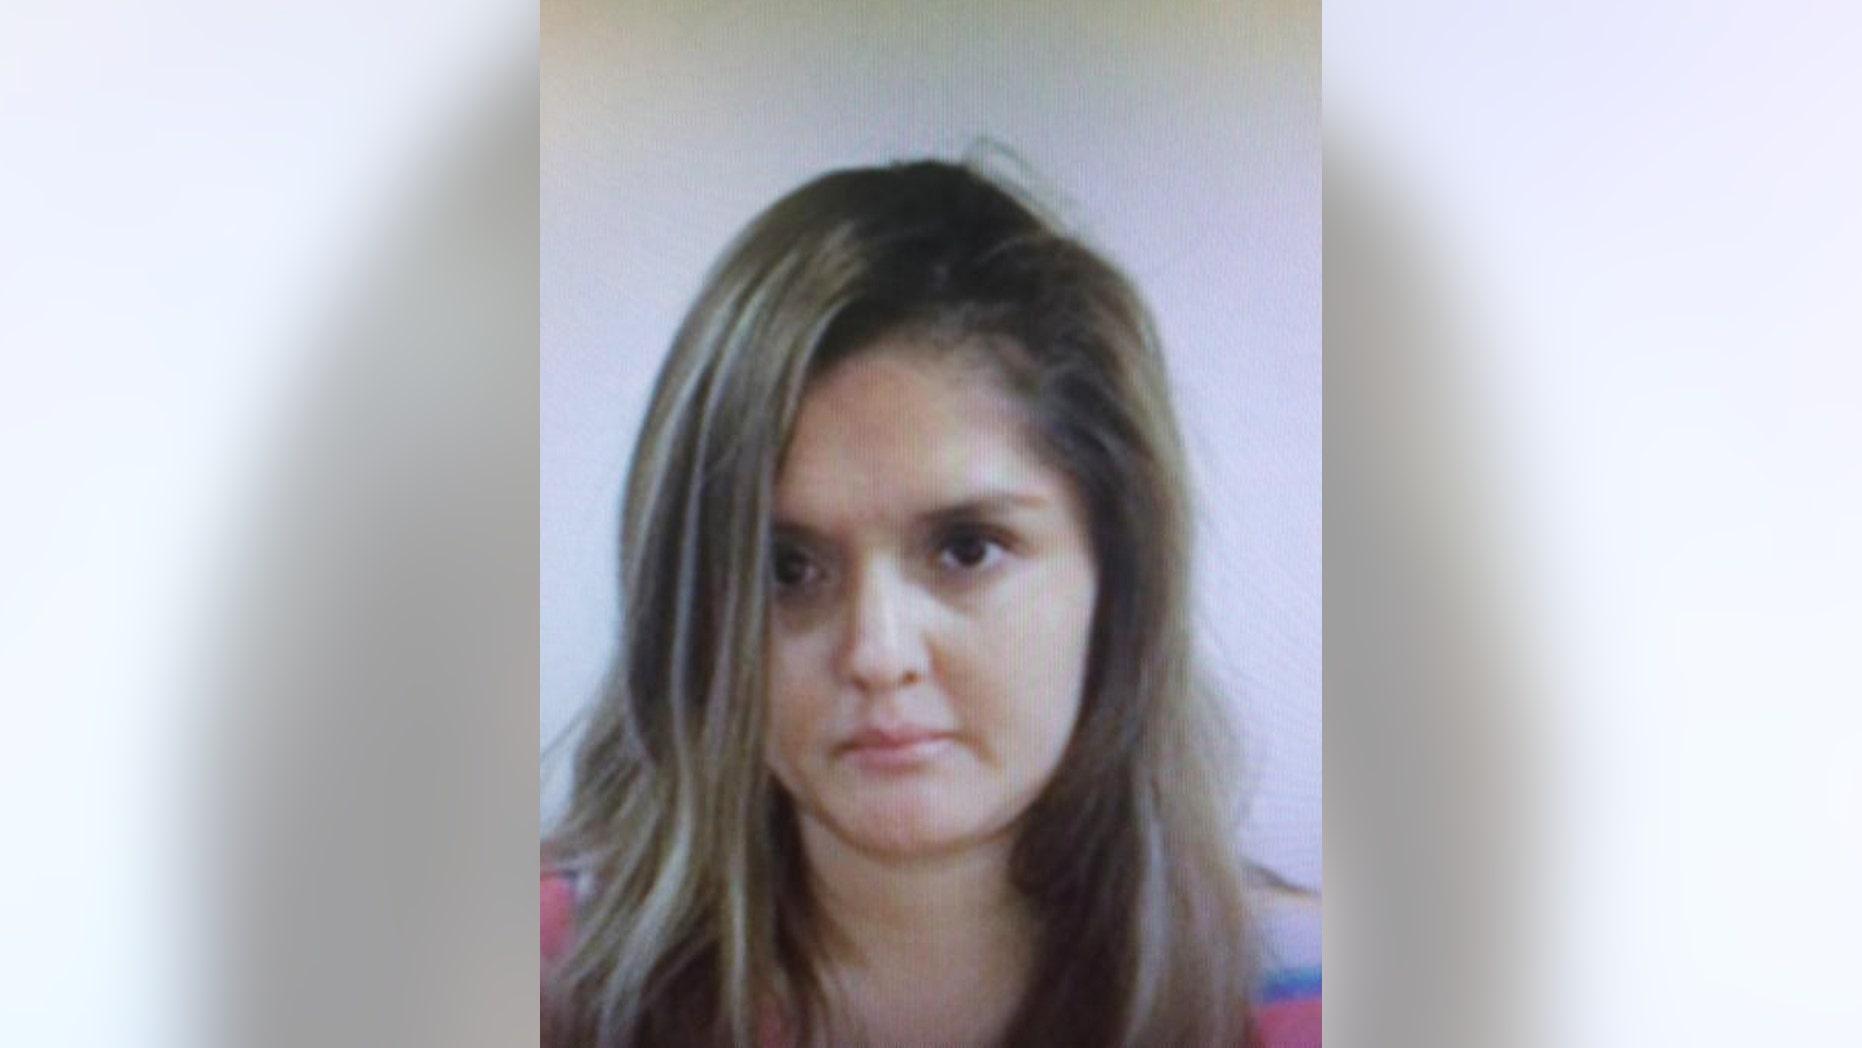 Undated handout photo of Brenda Delgado provided by the FBI.